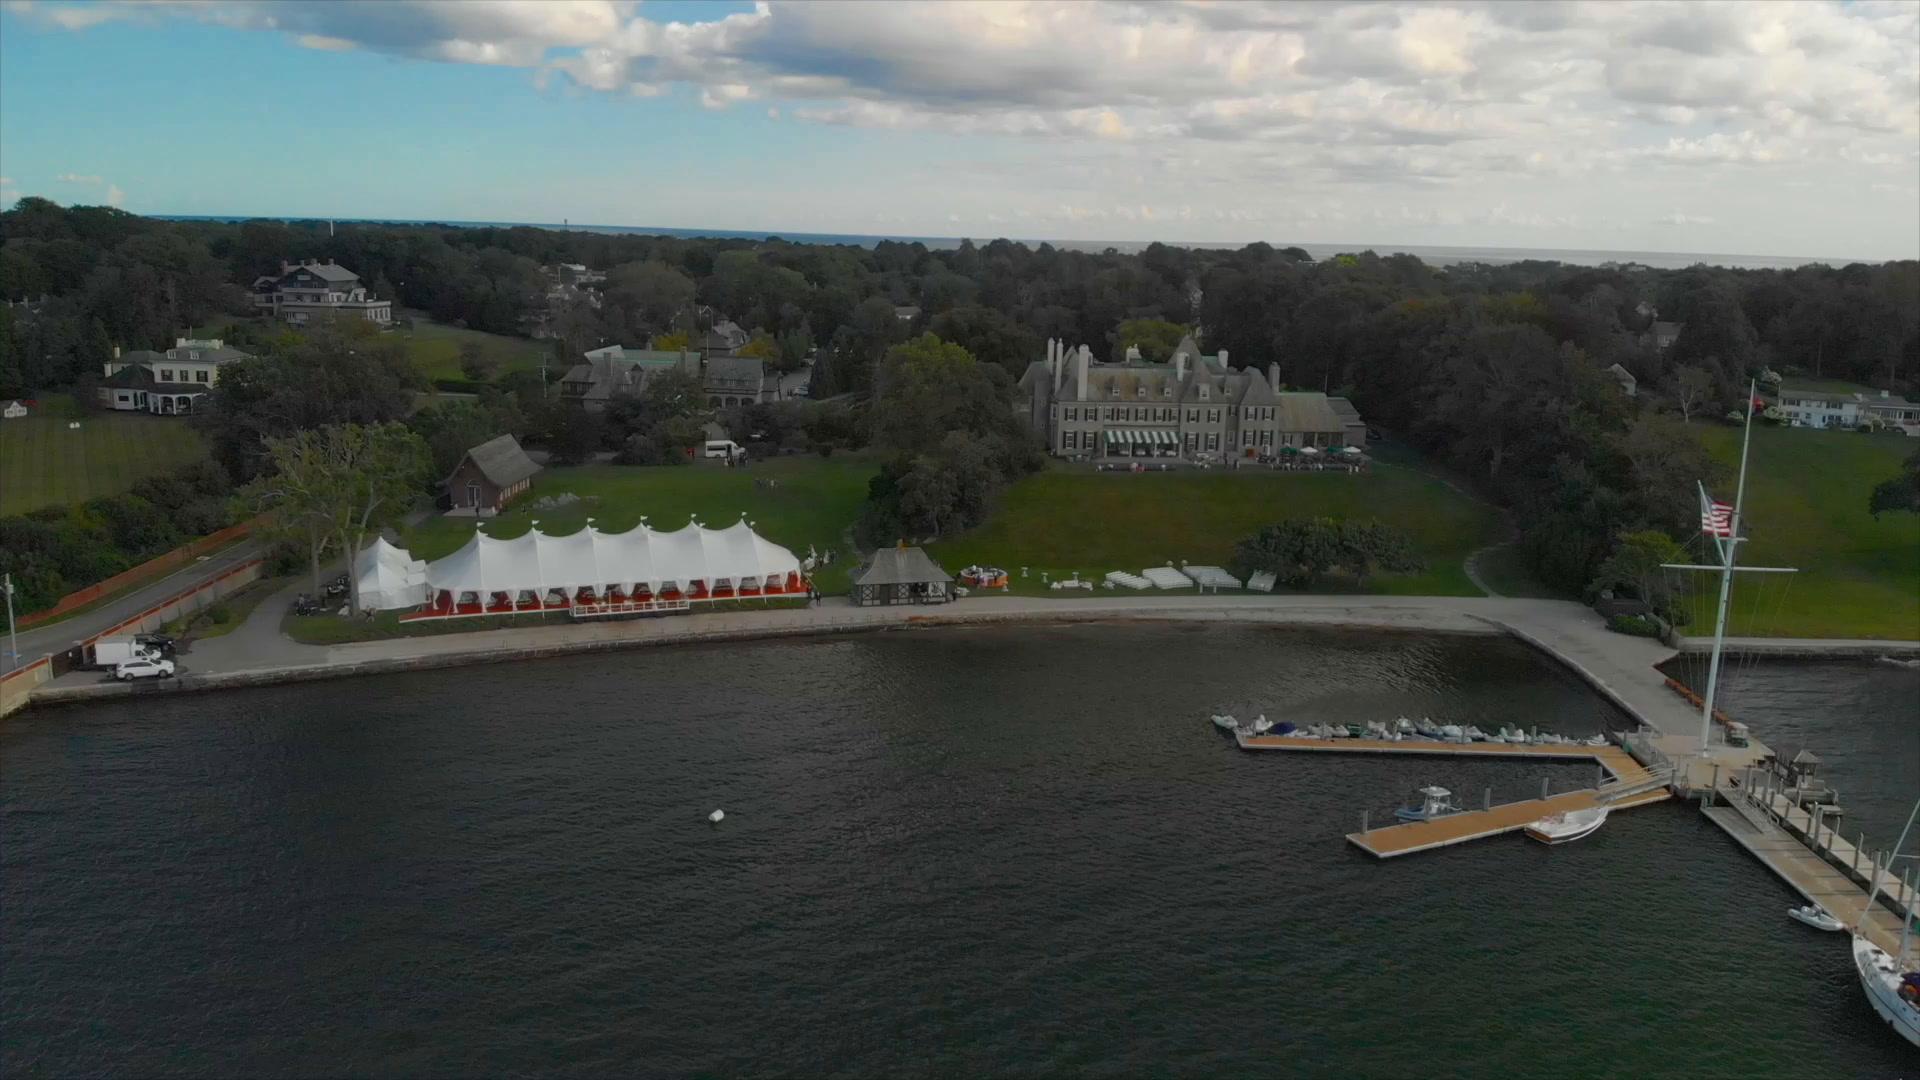 Sarah + Tommy | Newport, Rhode Island | New York Yacht Club